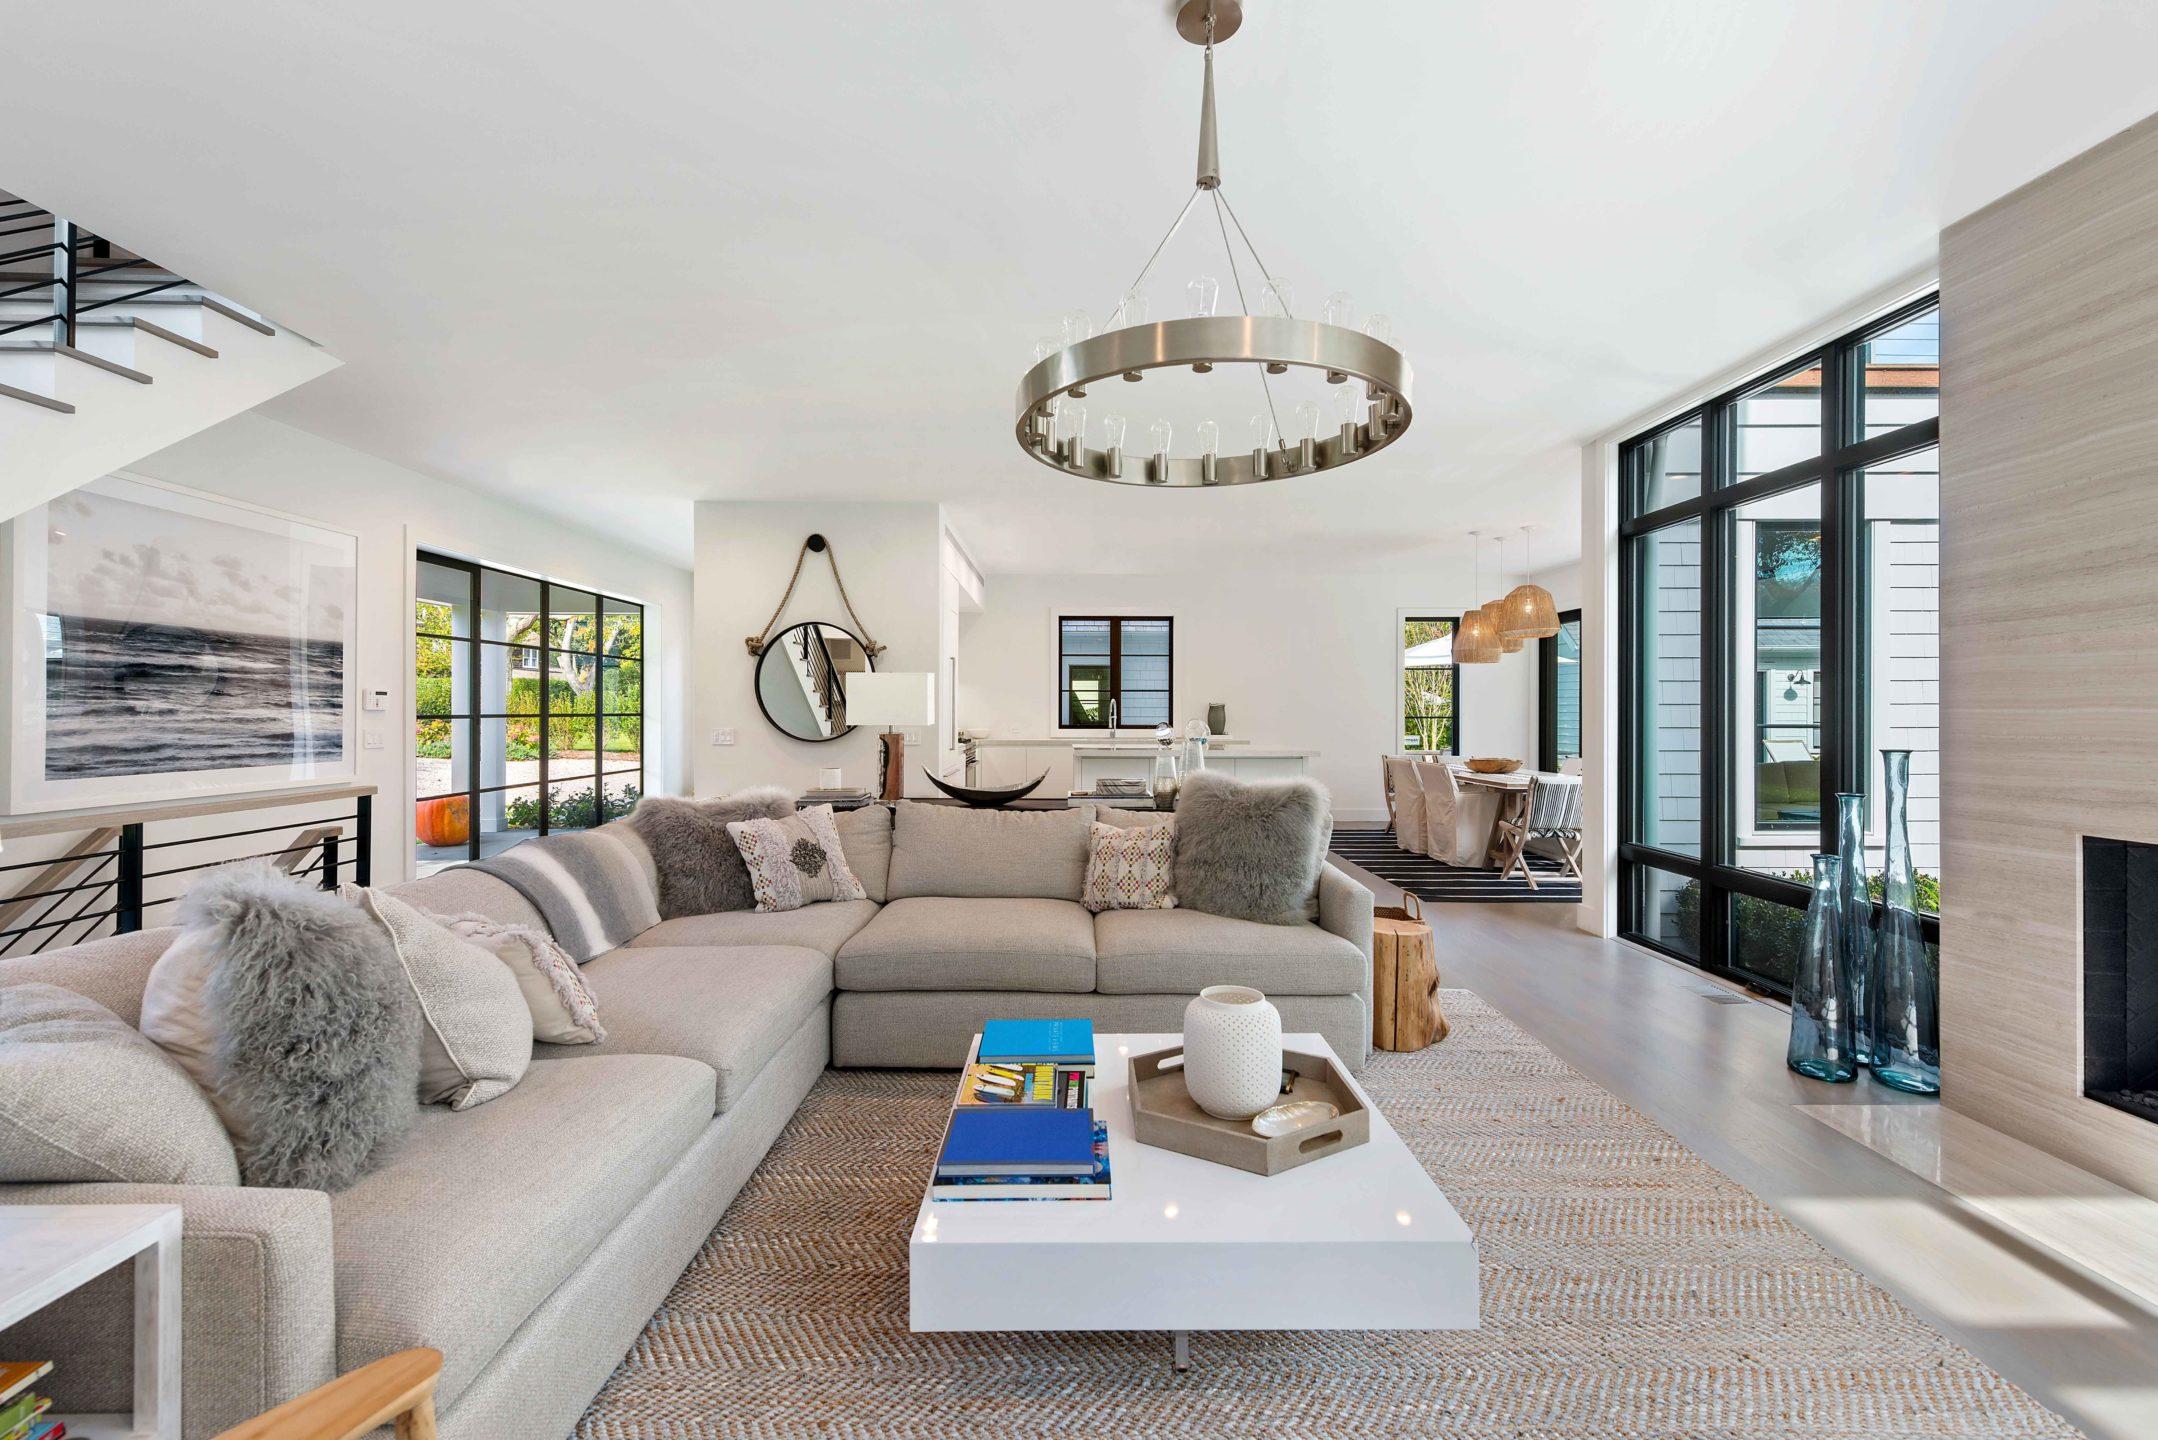 Nicole-Fuller-Interior-Designer-east-hampton-modern-bohemian-beach-house-living-room-2